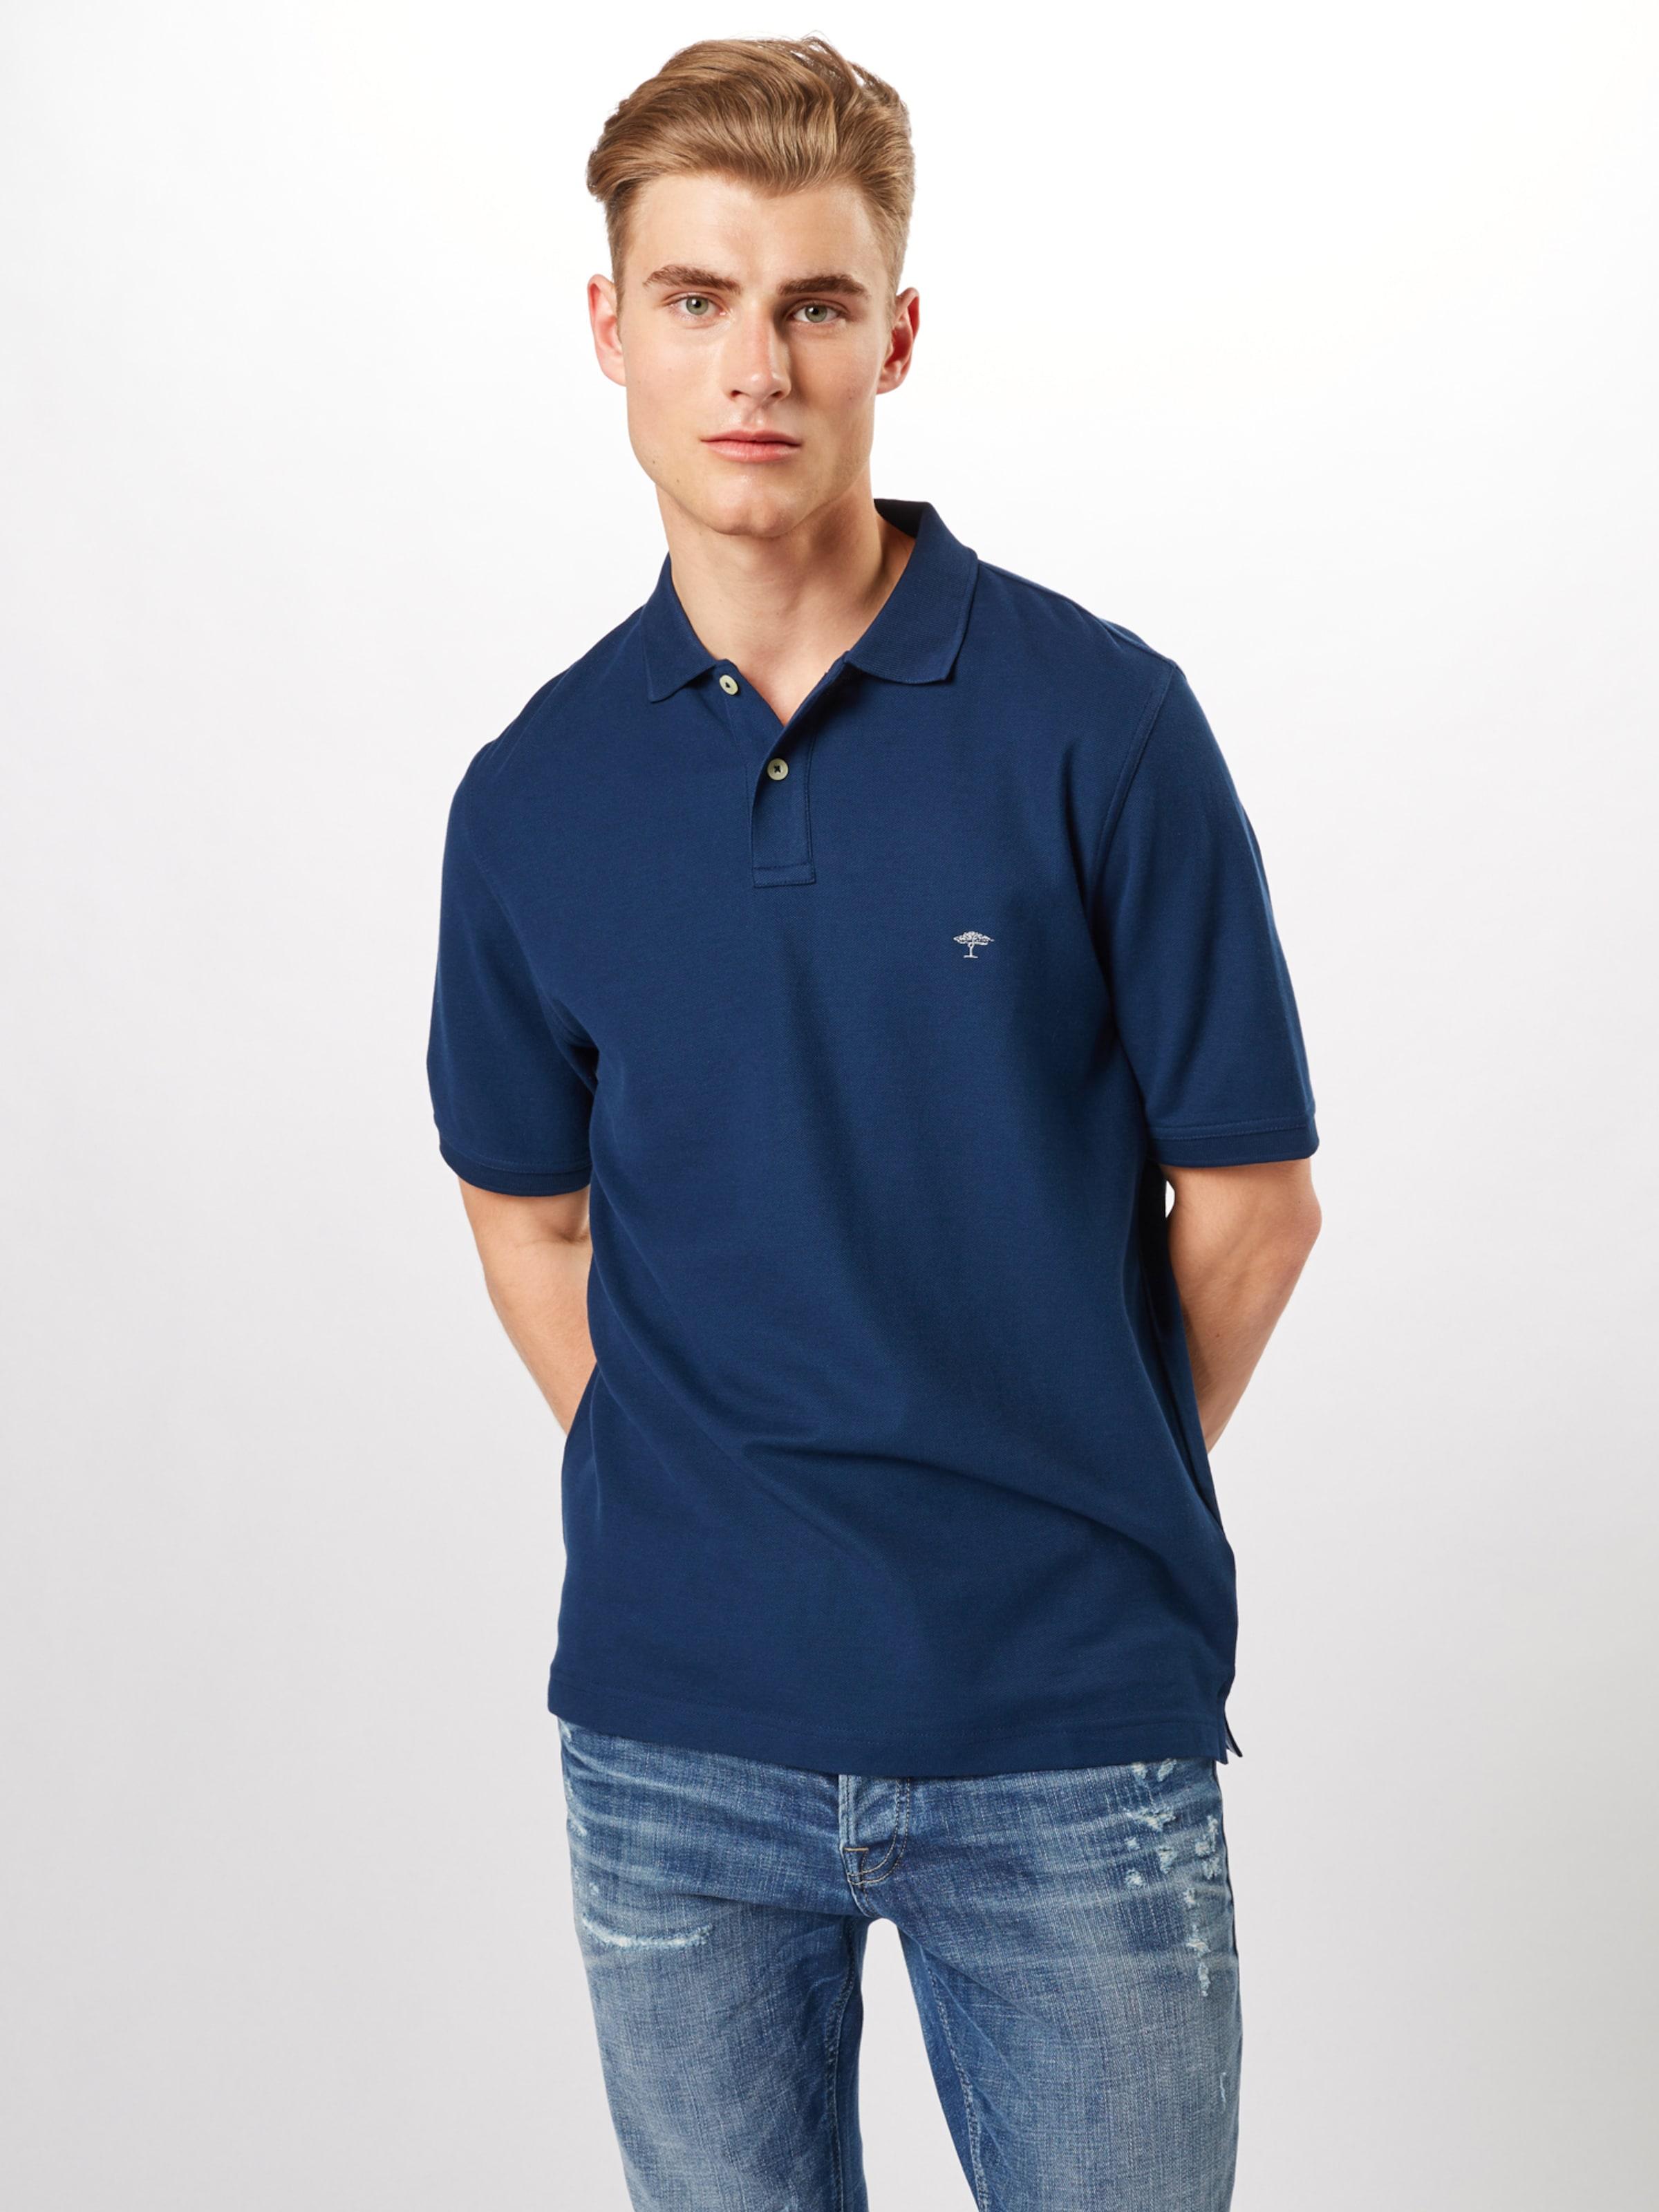 shirt Bleu hatton Nuit En Fynch T lFKJc1